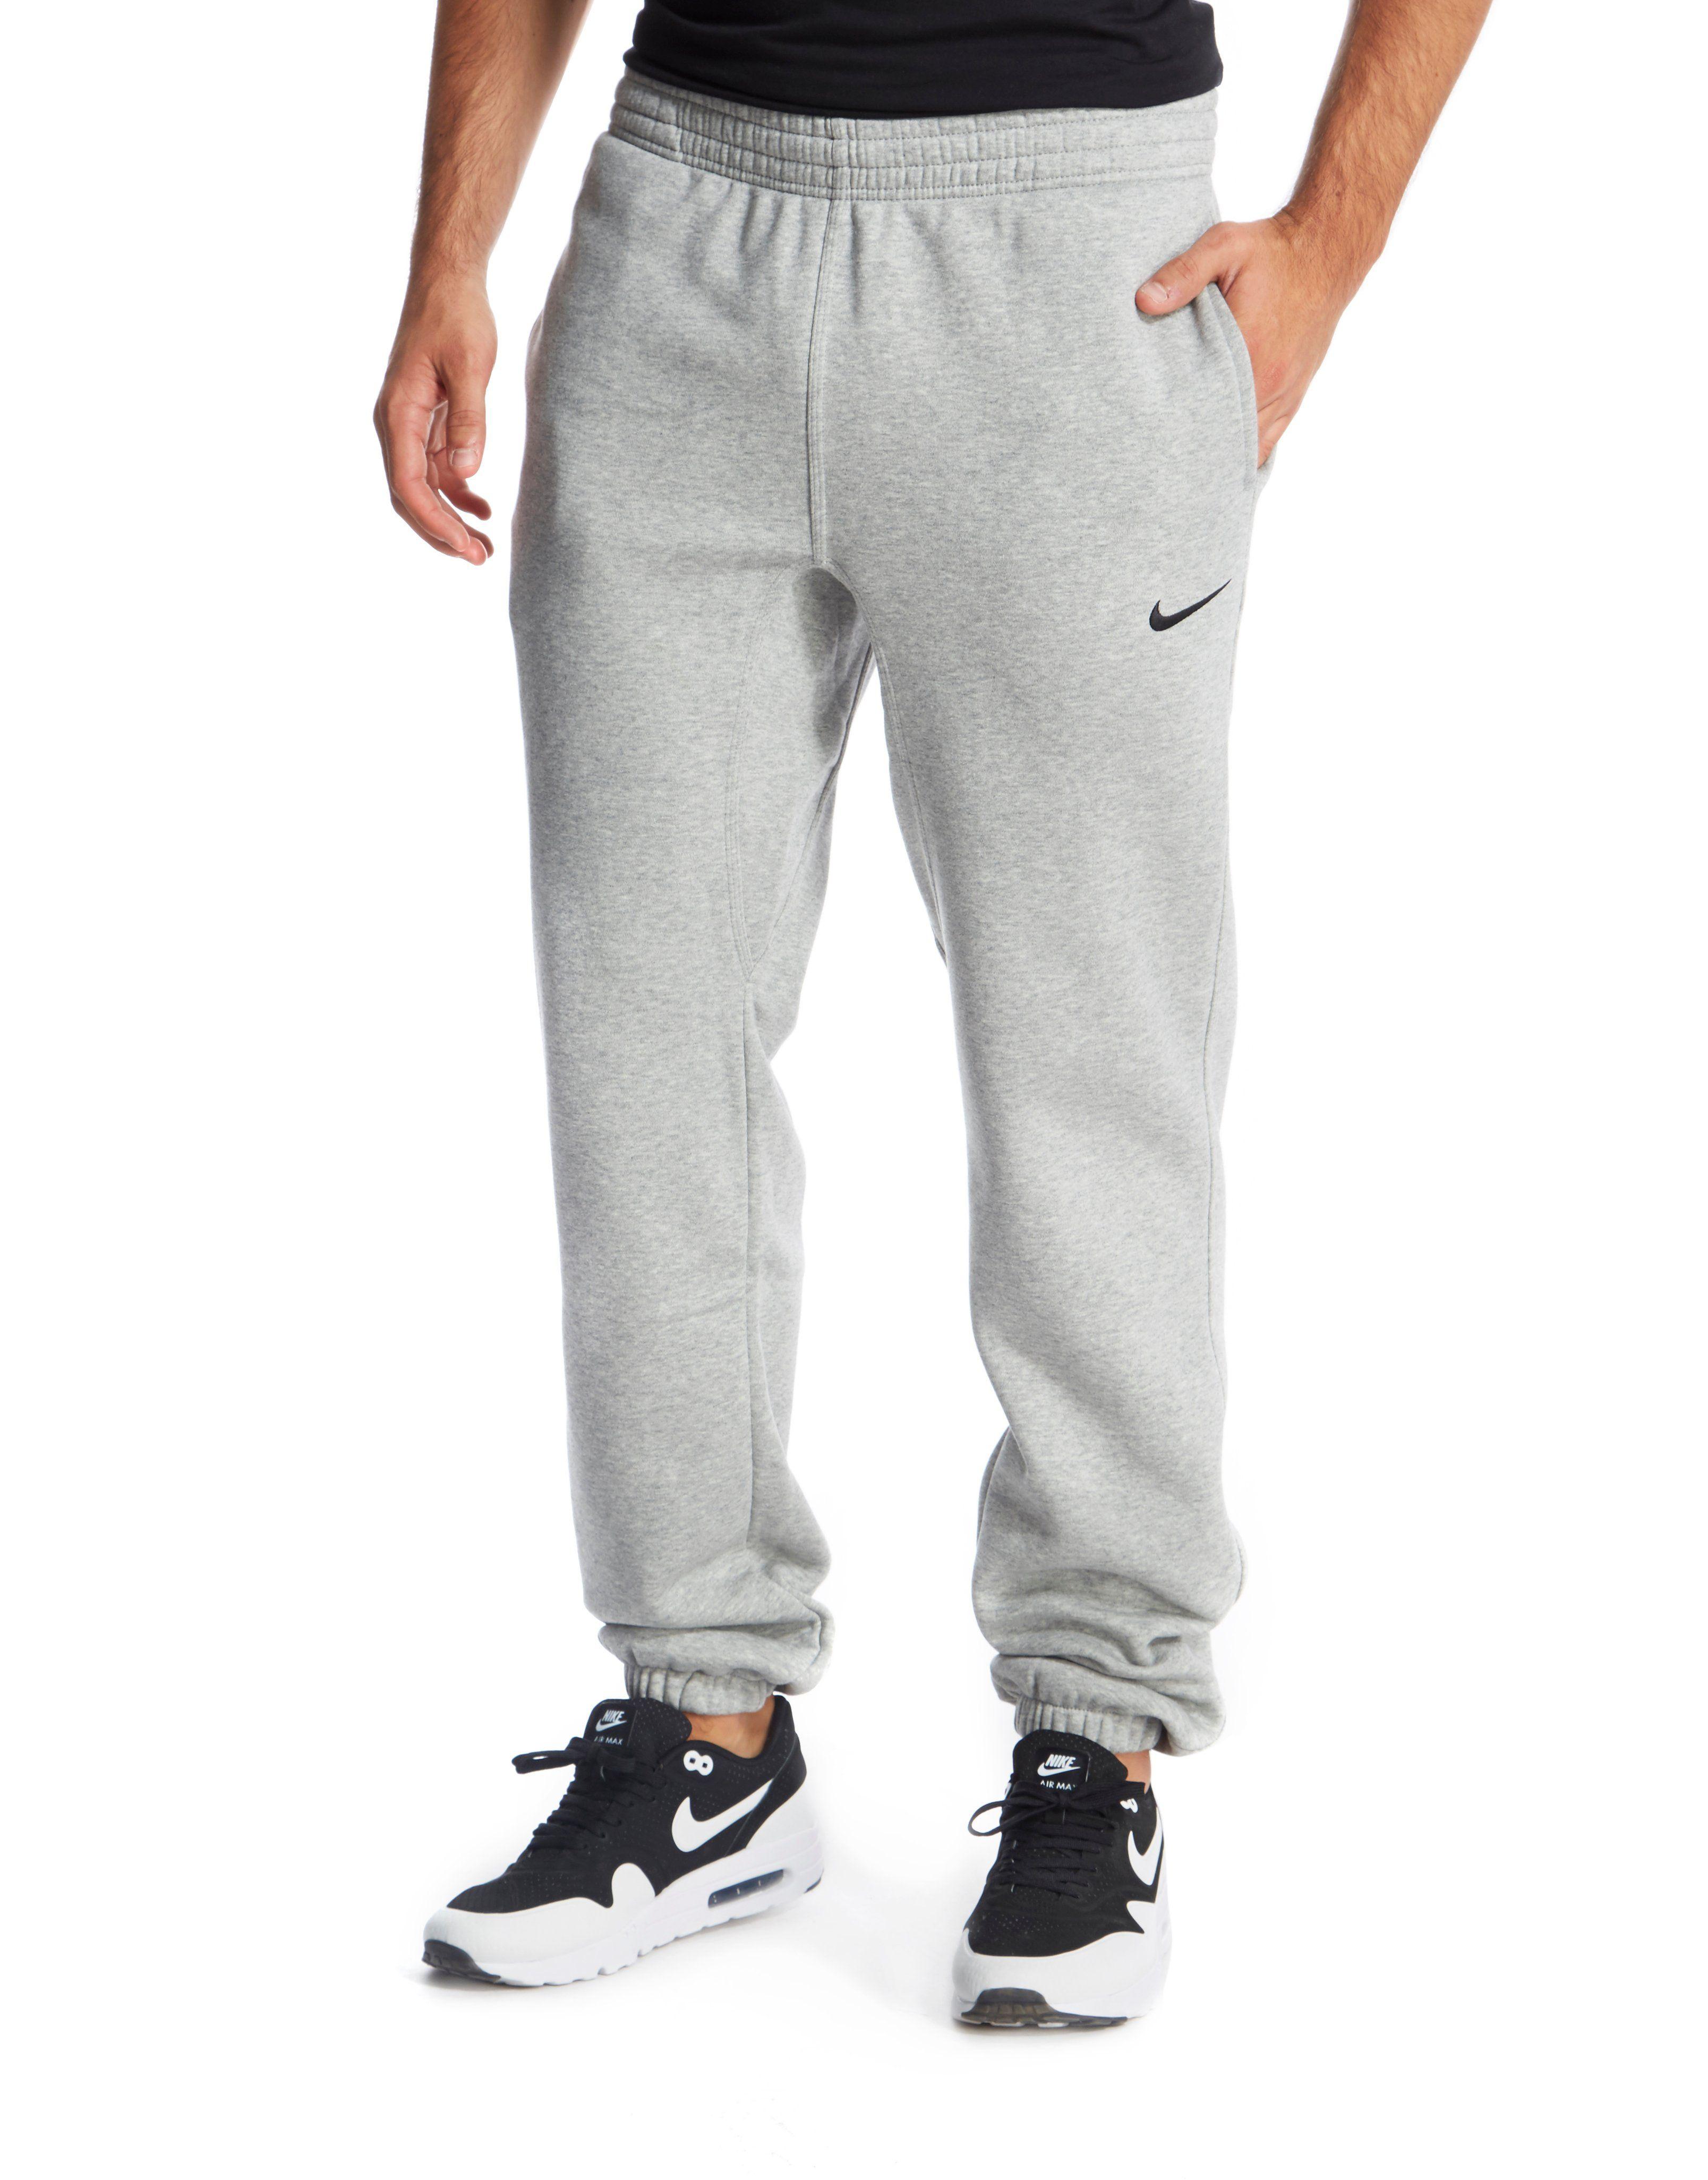 Model Nike Jogging Pants  Freemans